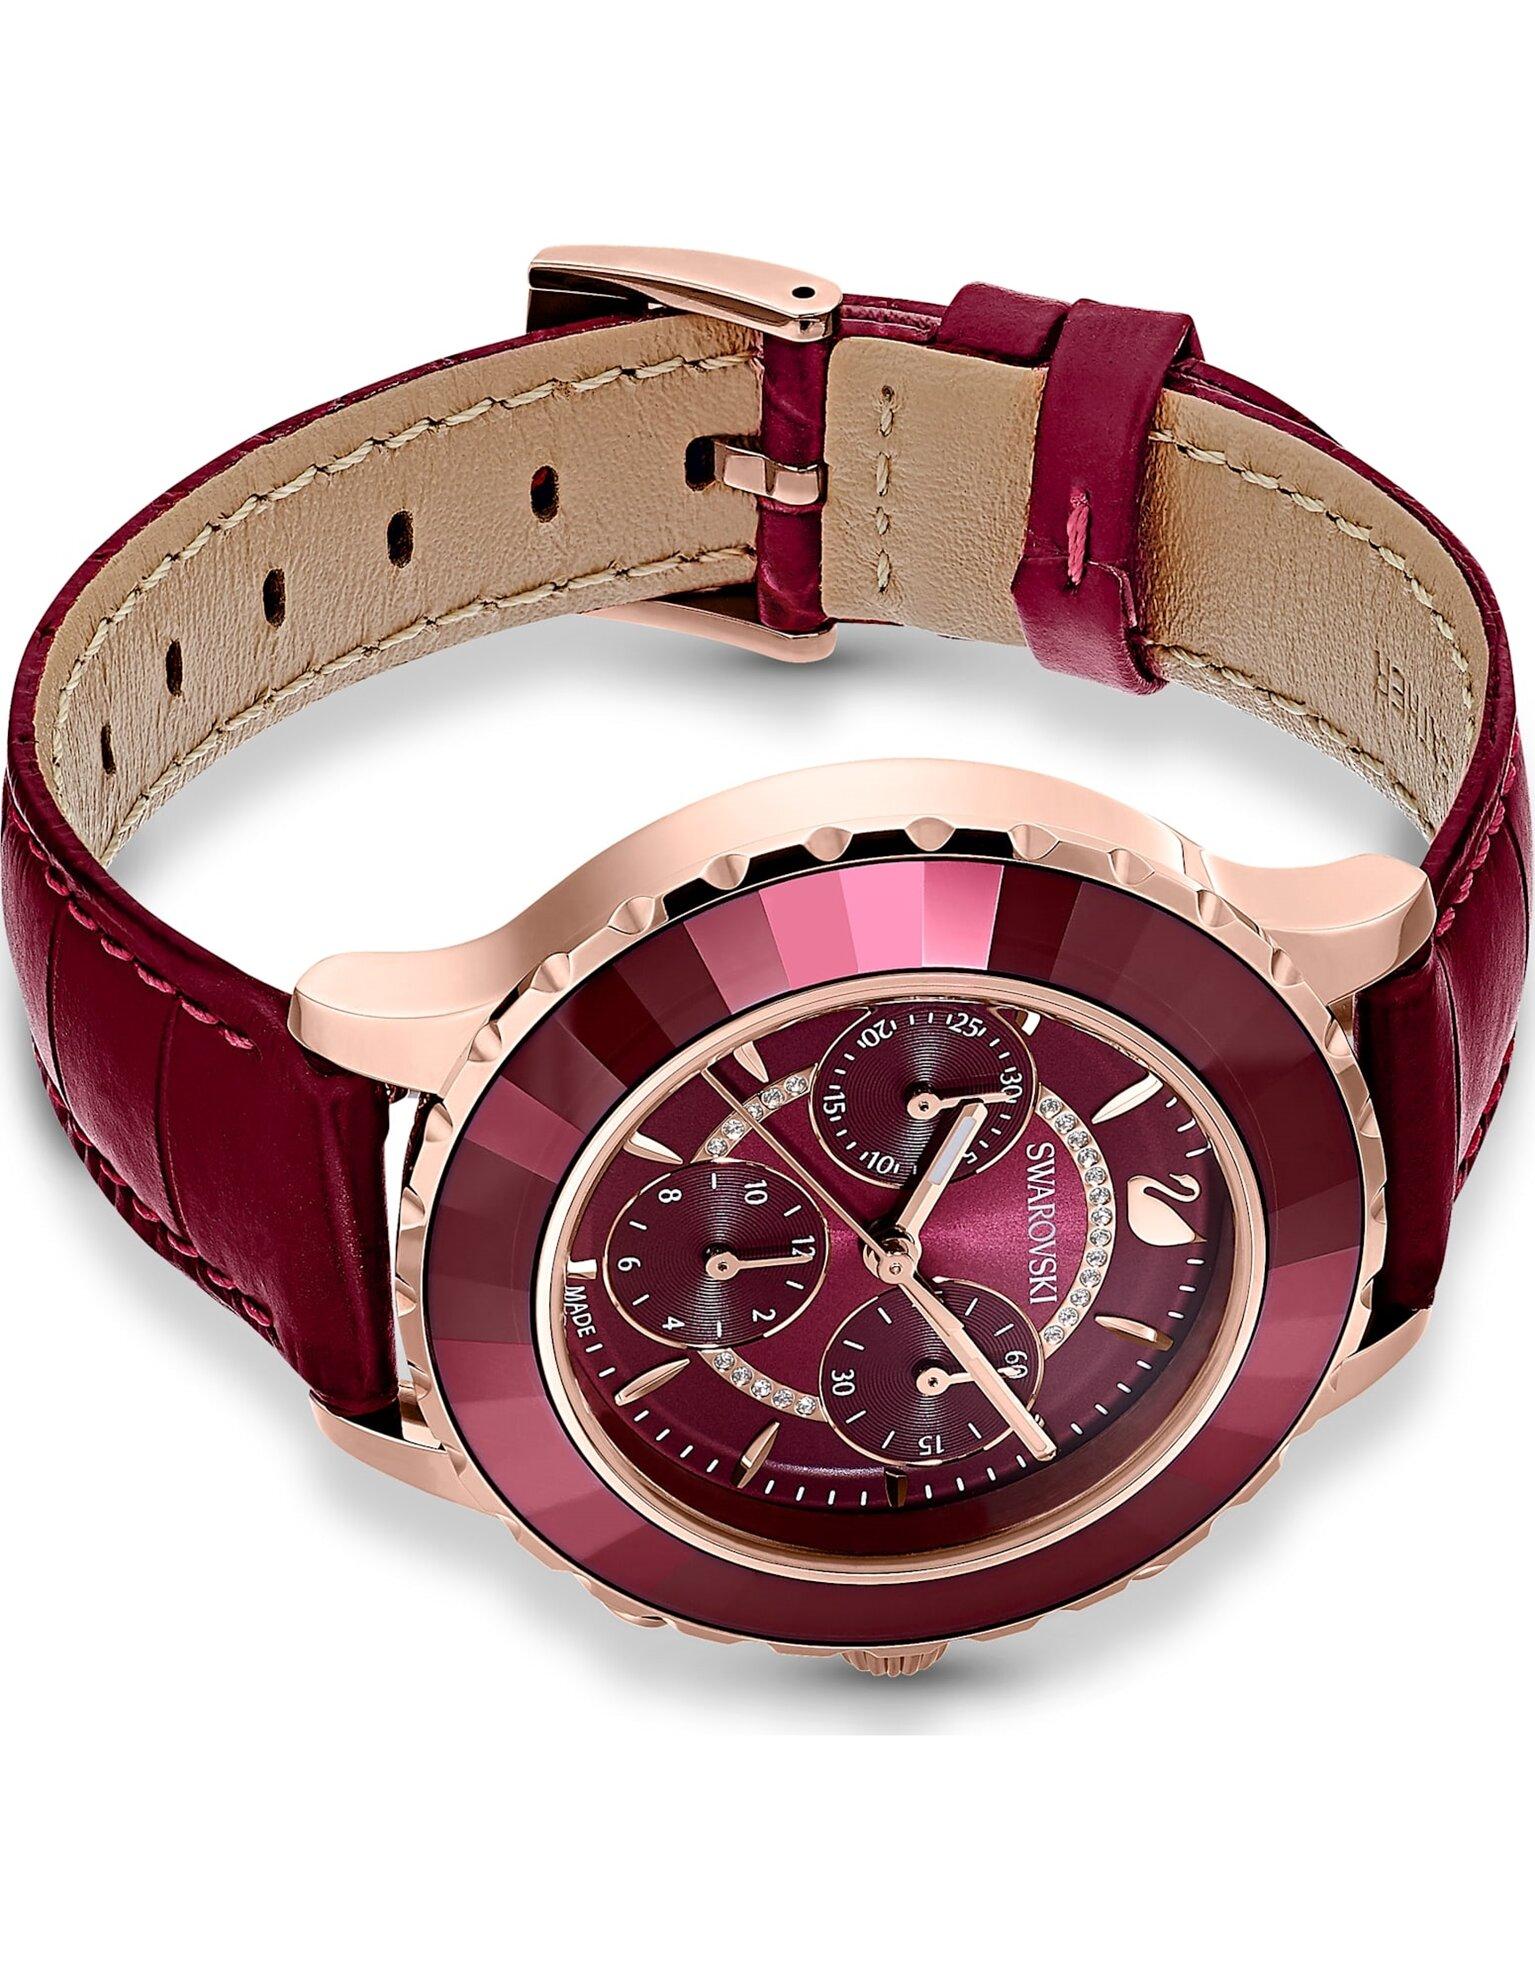 Picture of Octea Lux Chrono Saat, Deri kayış, Kırmızı, Pembe altın rengi PVD